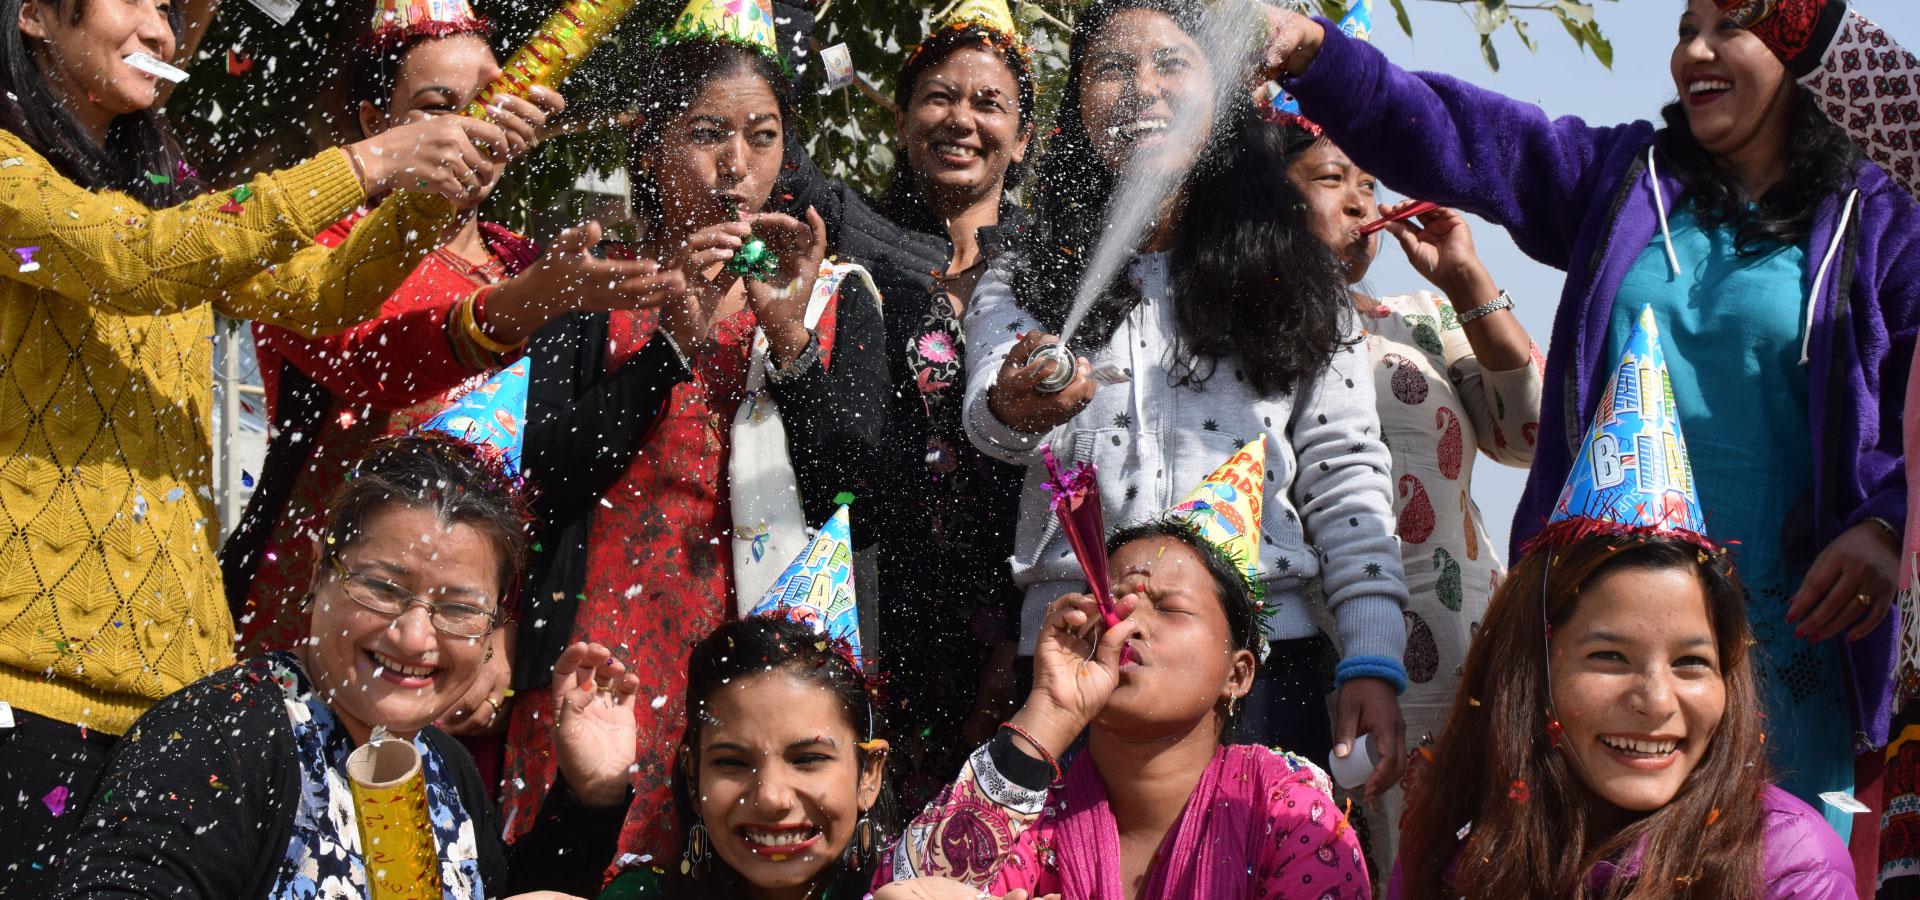 Dinadi celebration